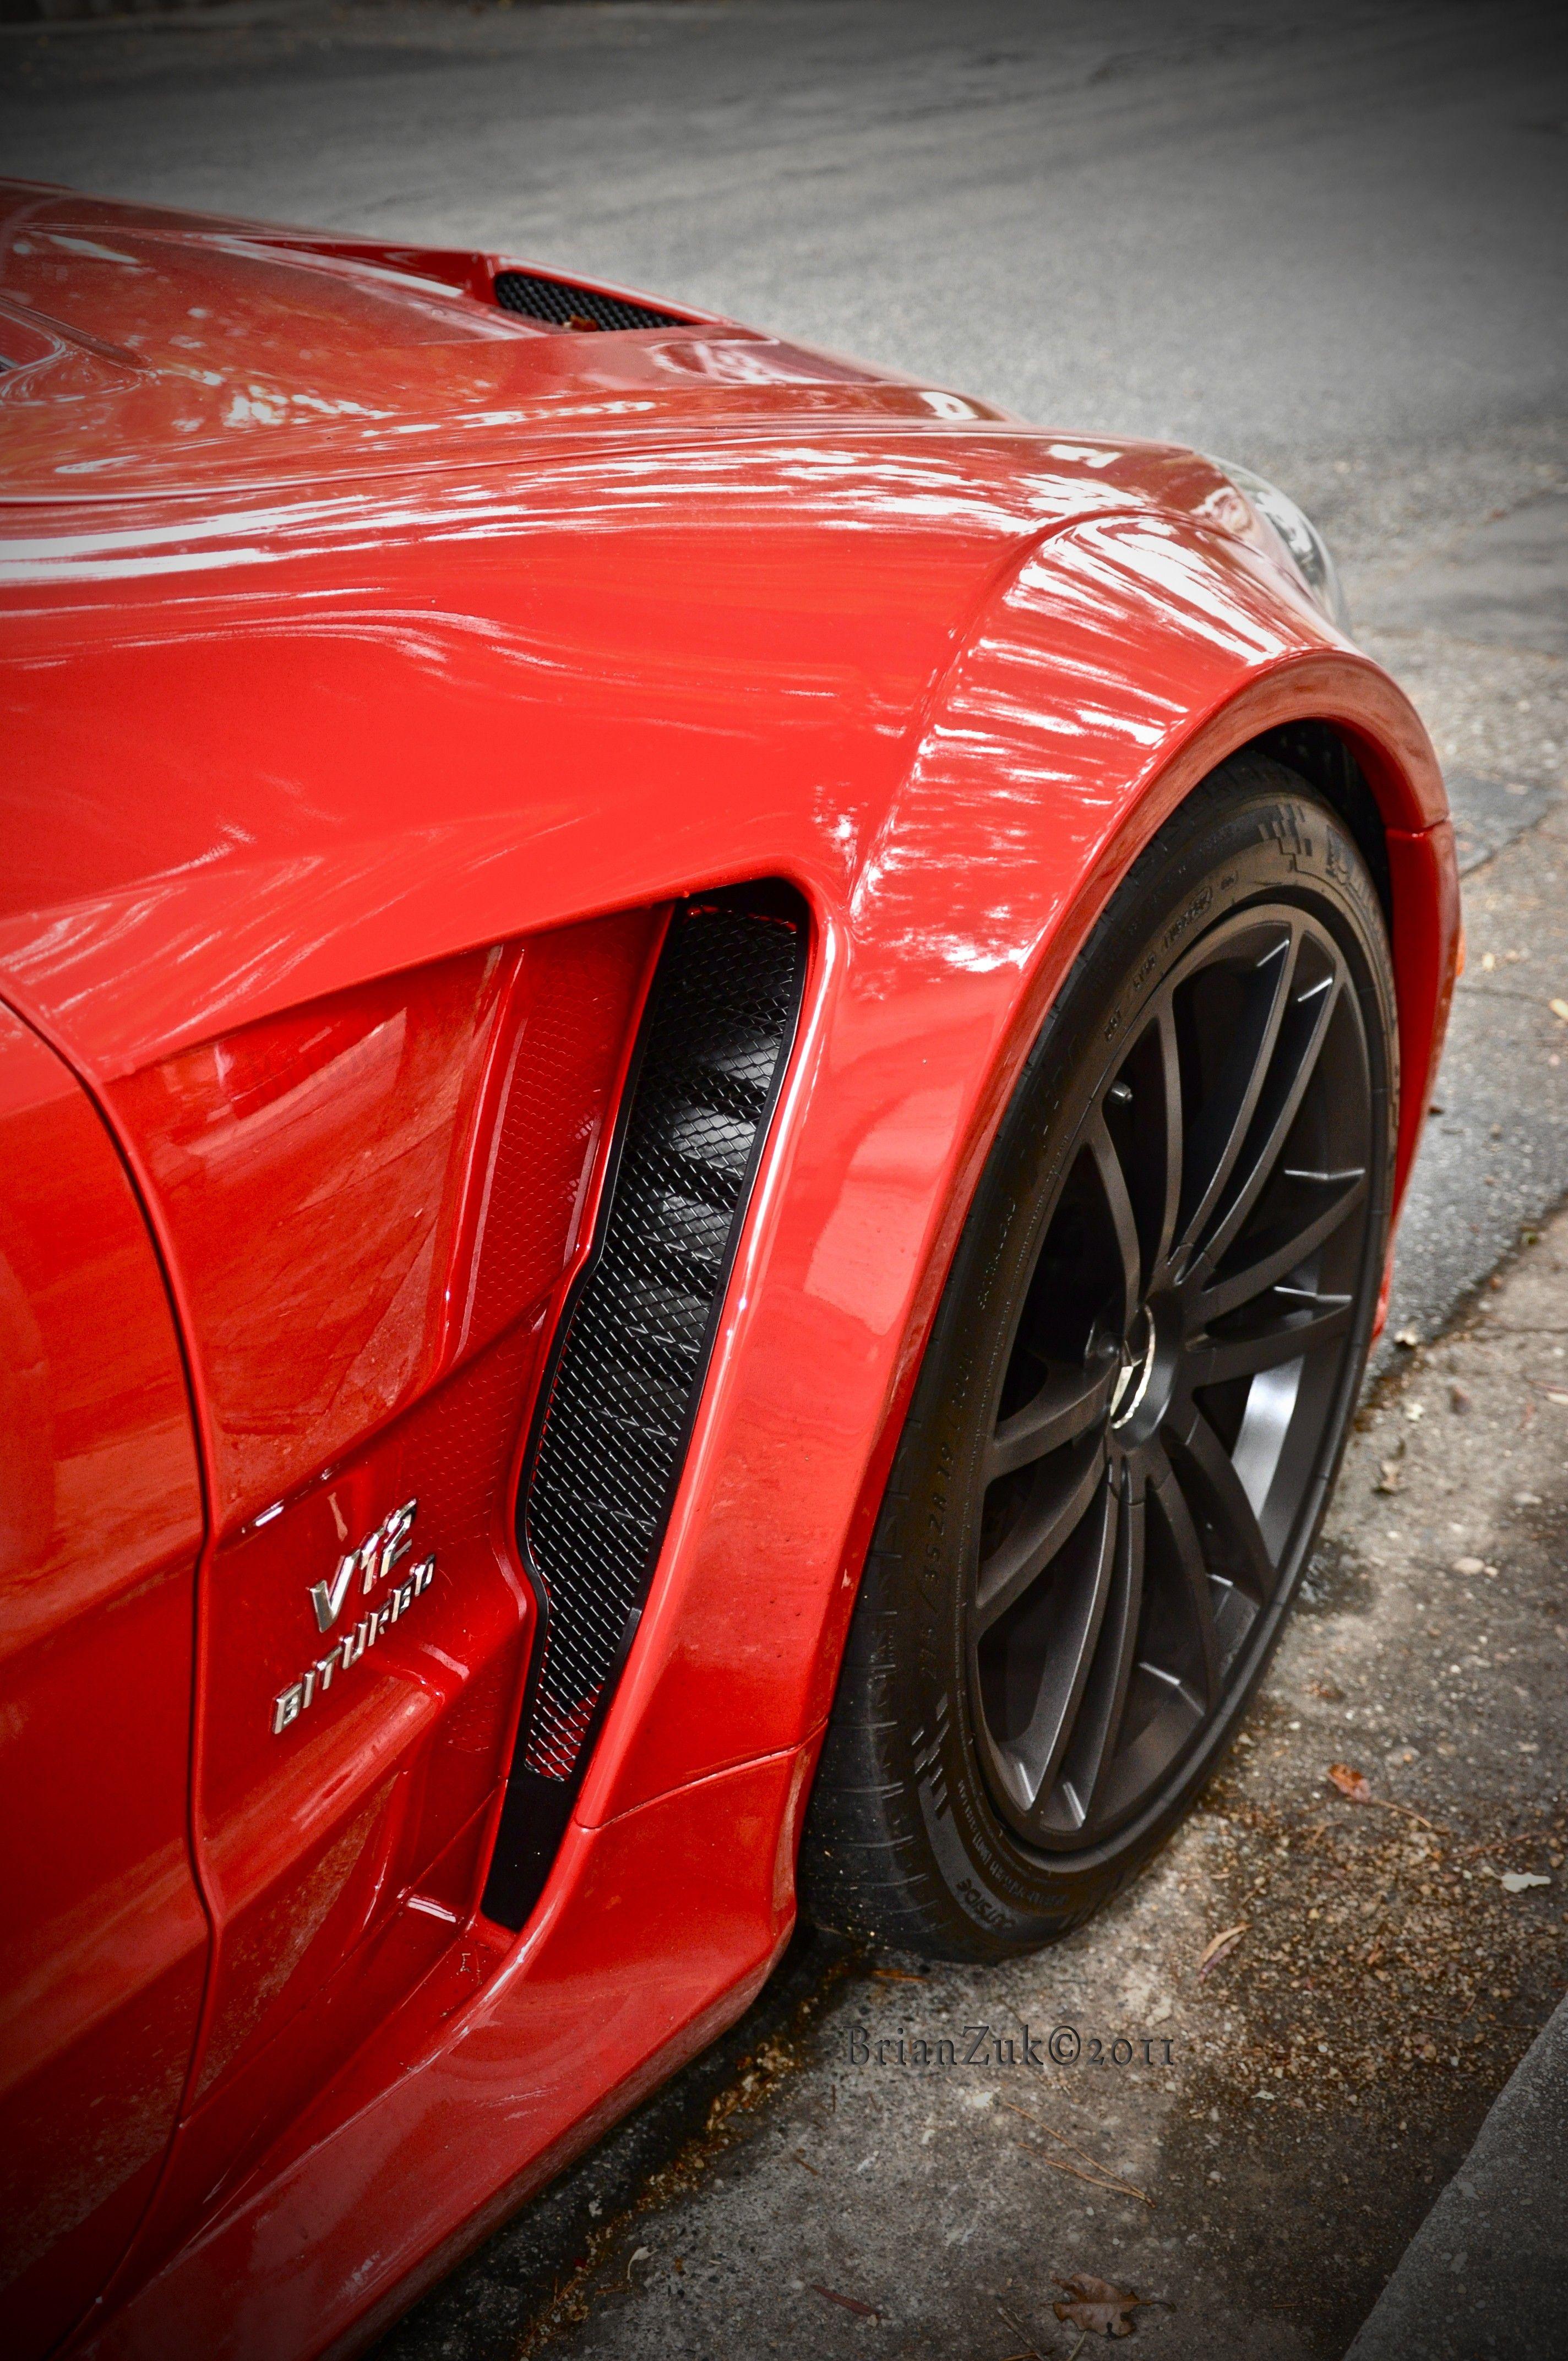 Brianzuk Spots An Absolutely Stunning Red Mercedes Sl65